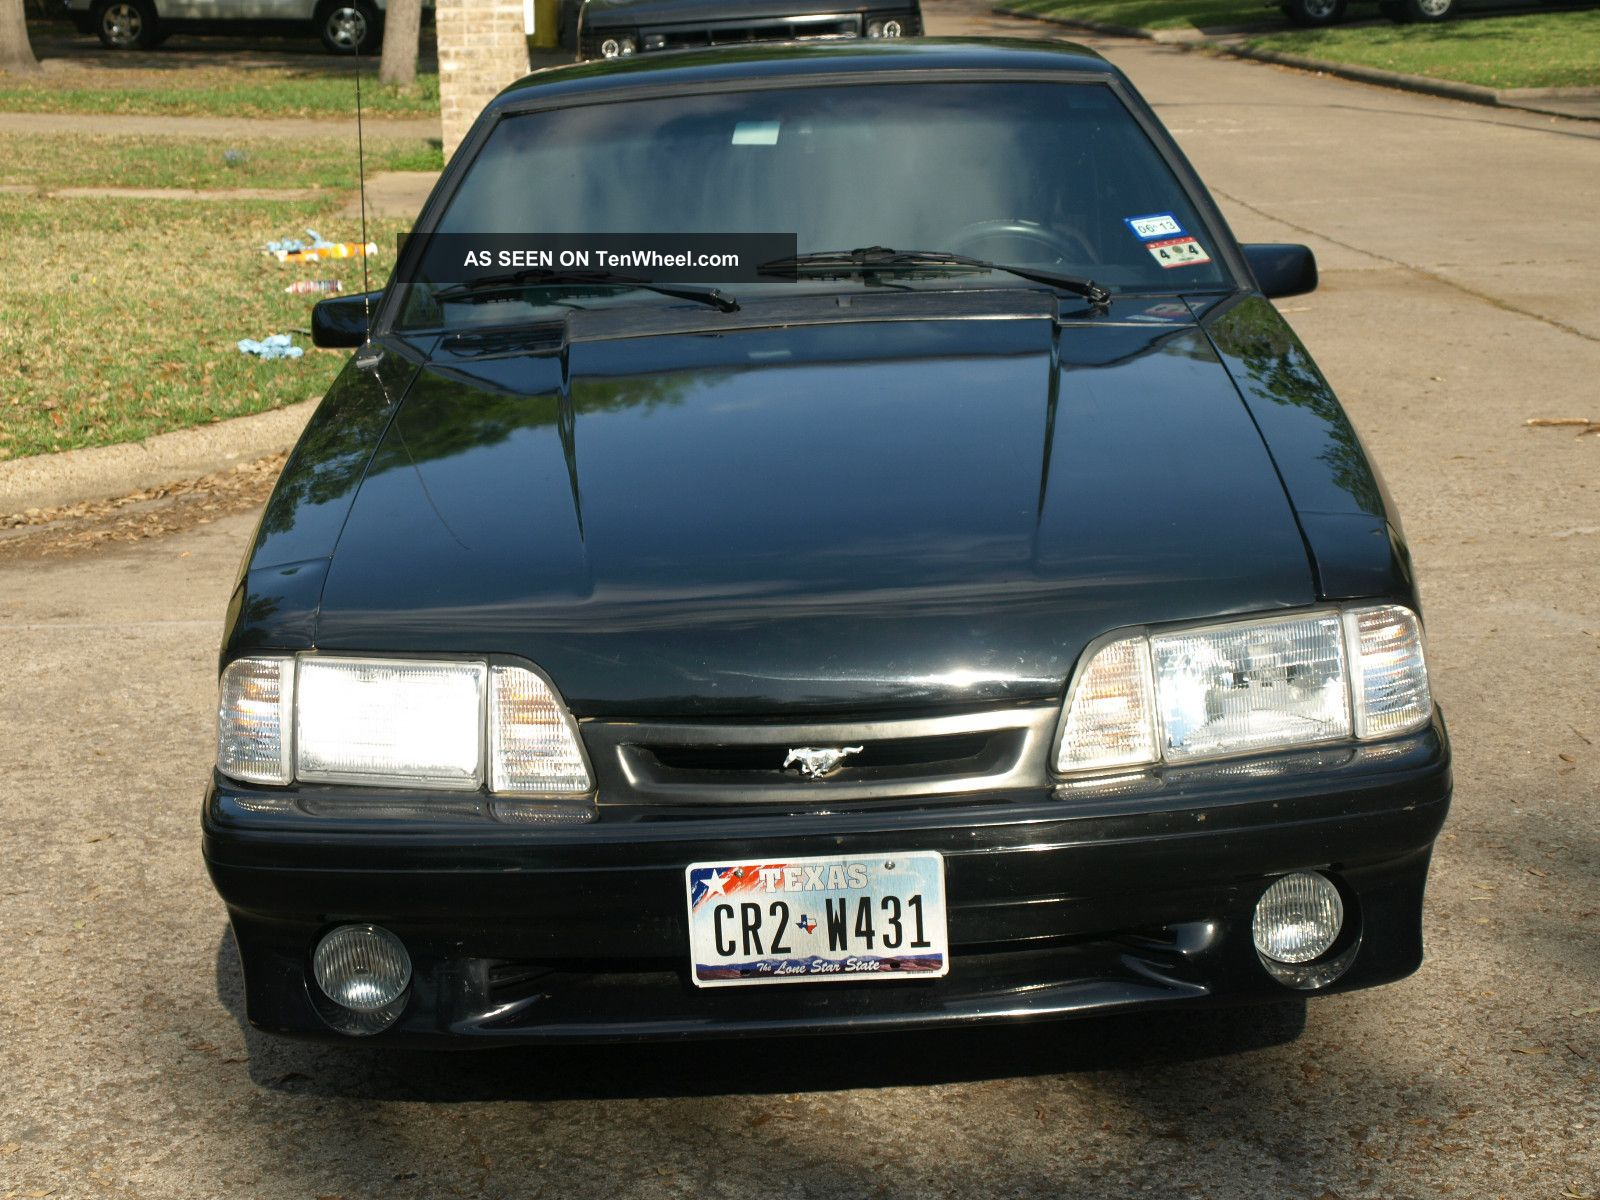 Ford Mustang Gt Hatchback Door L Lgw